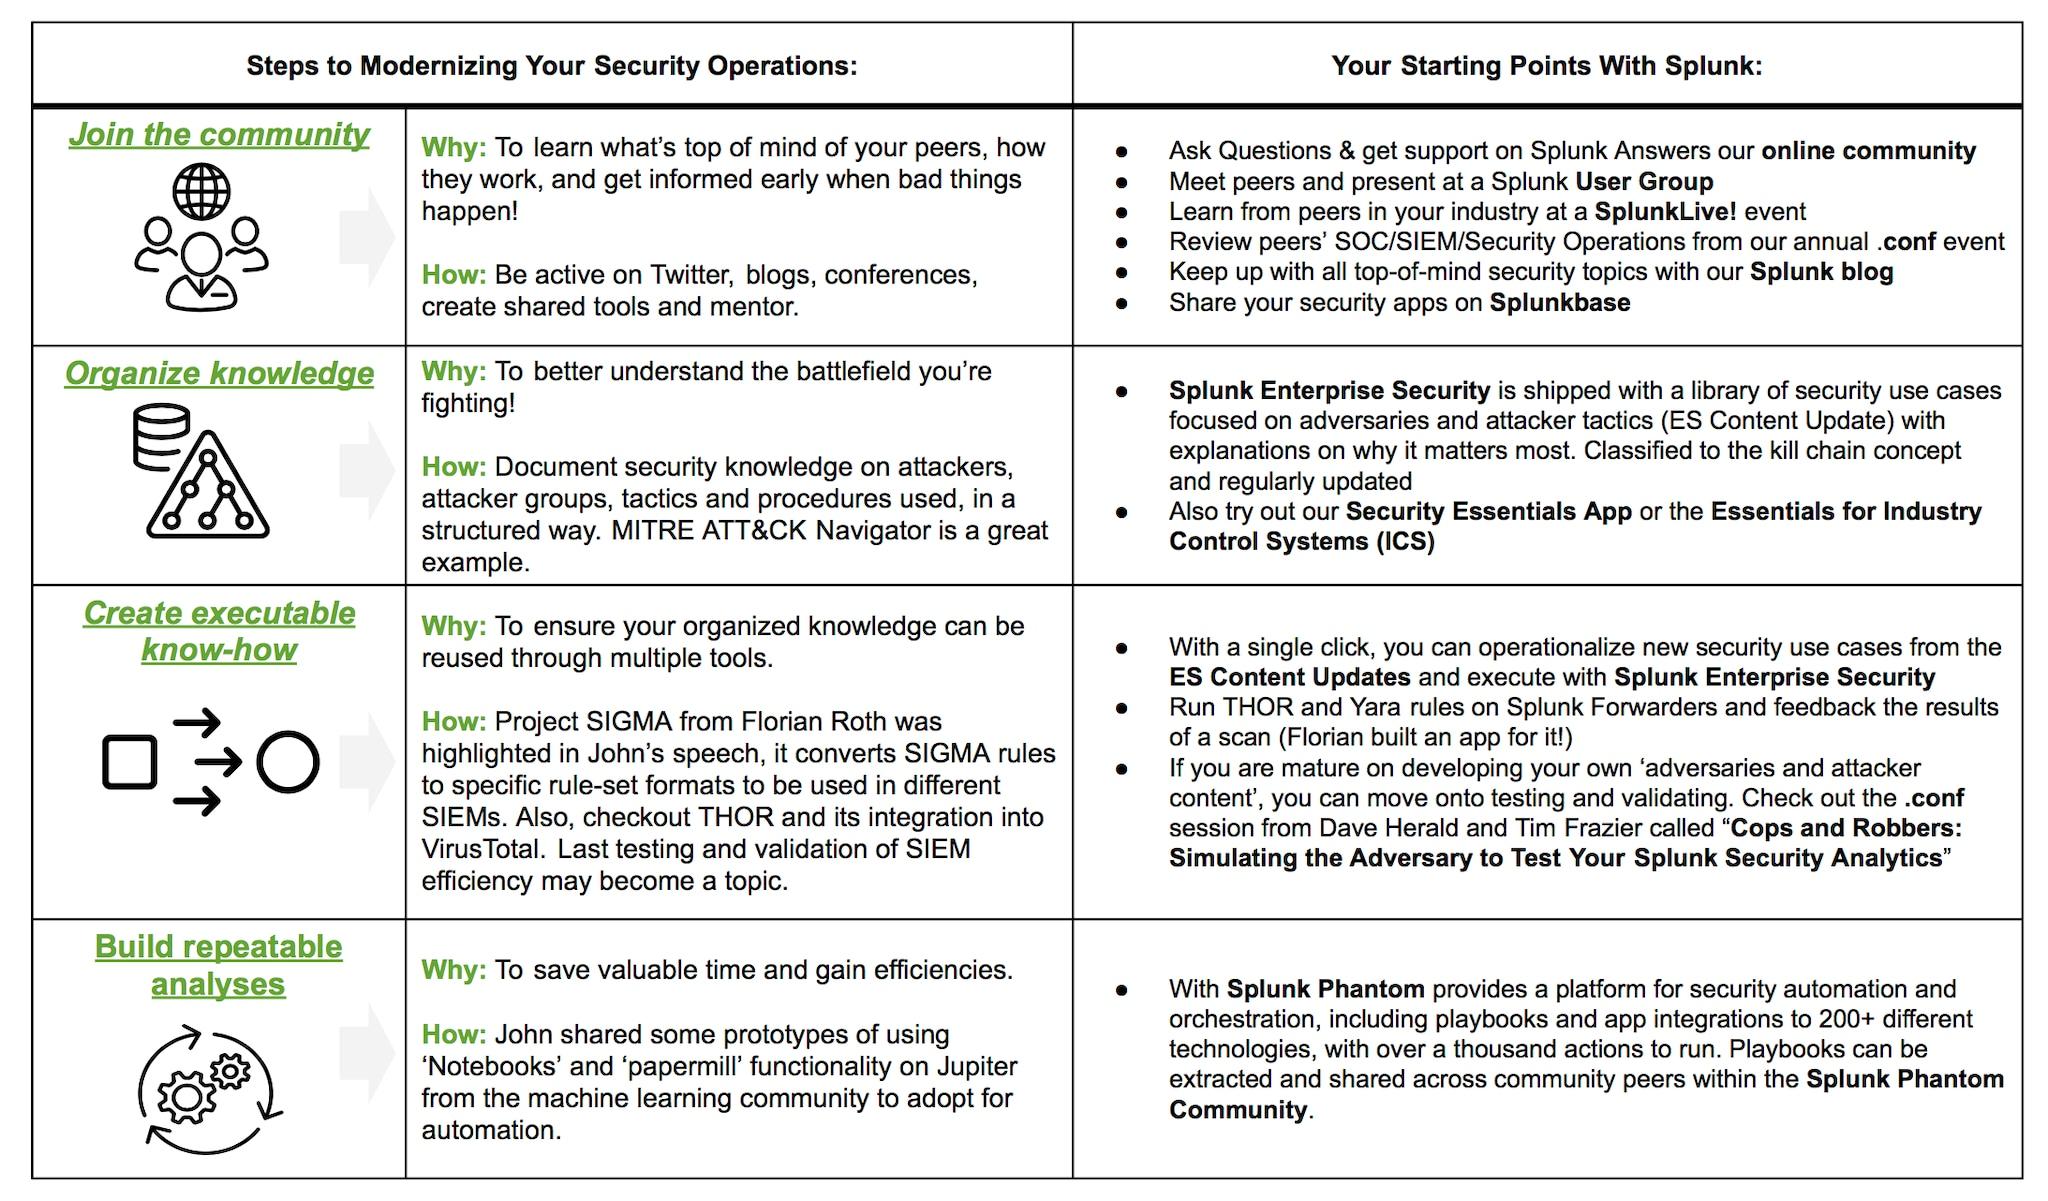 Shifting Mindsets: Modernizing the Security Operations Center